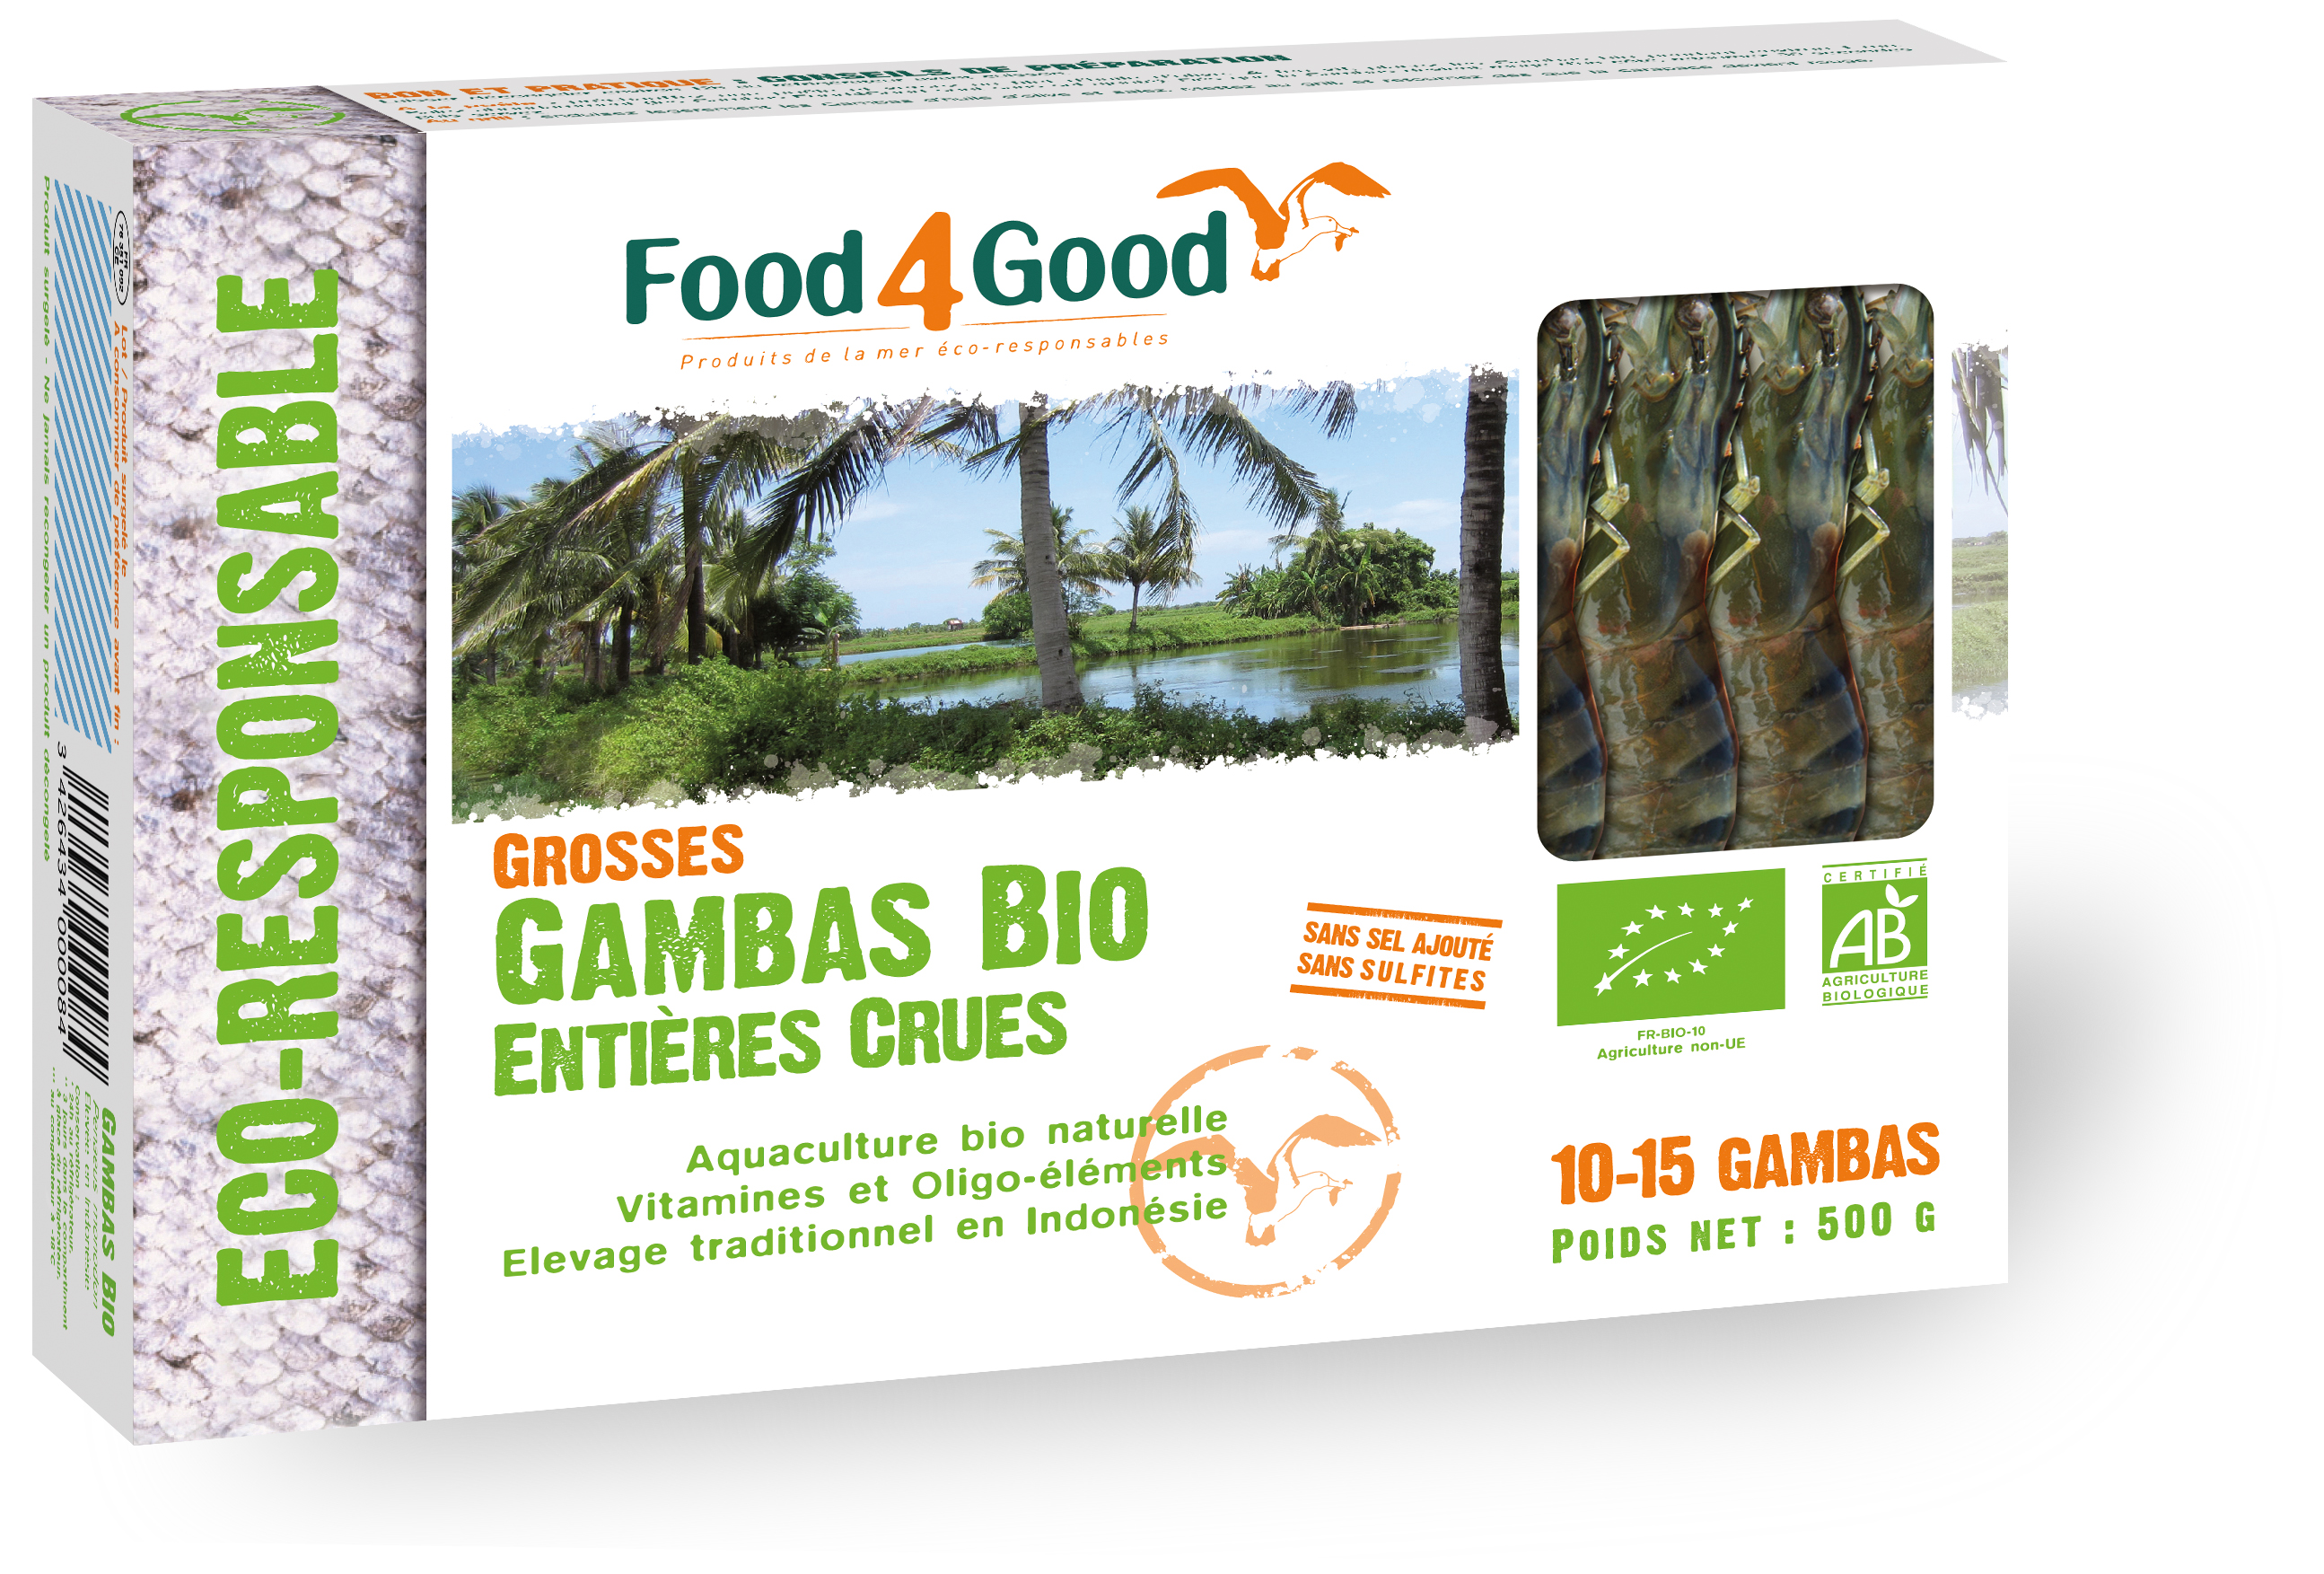 Food4Good - Gambas bio